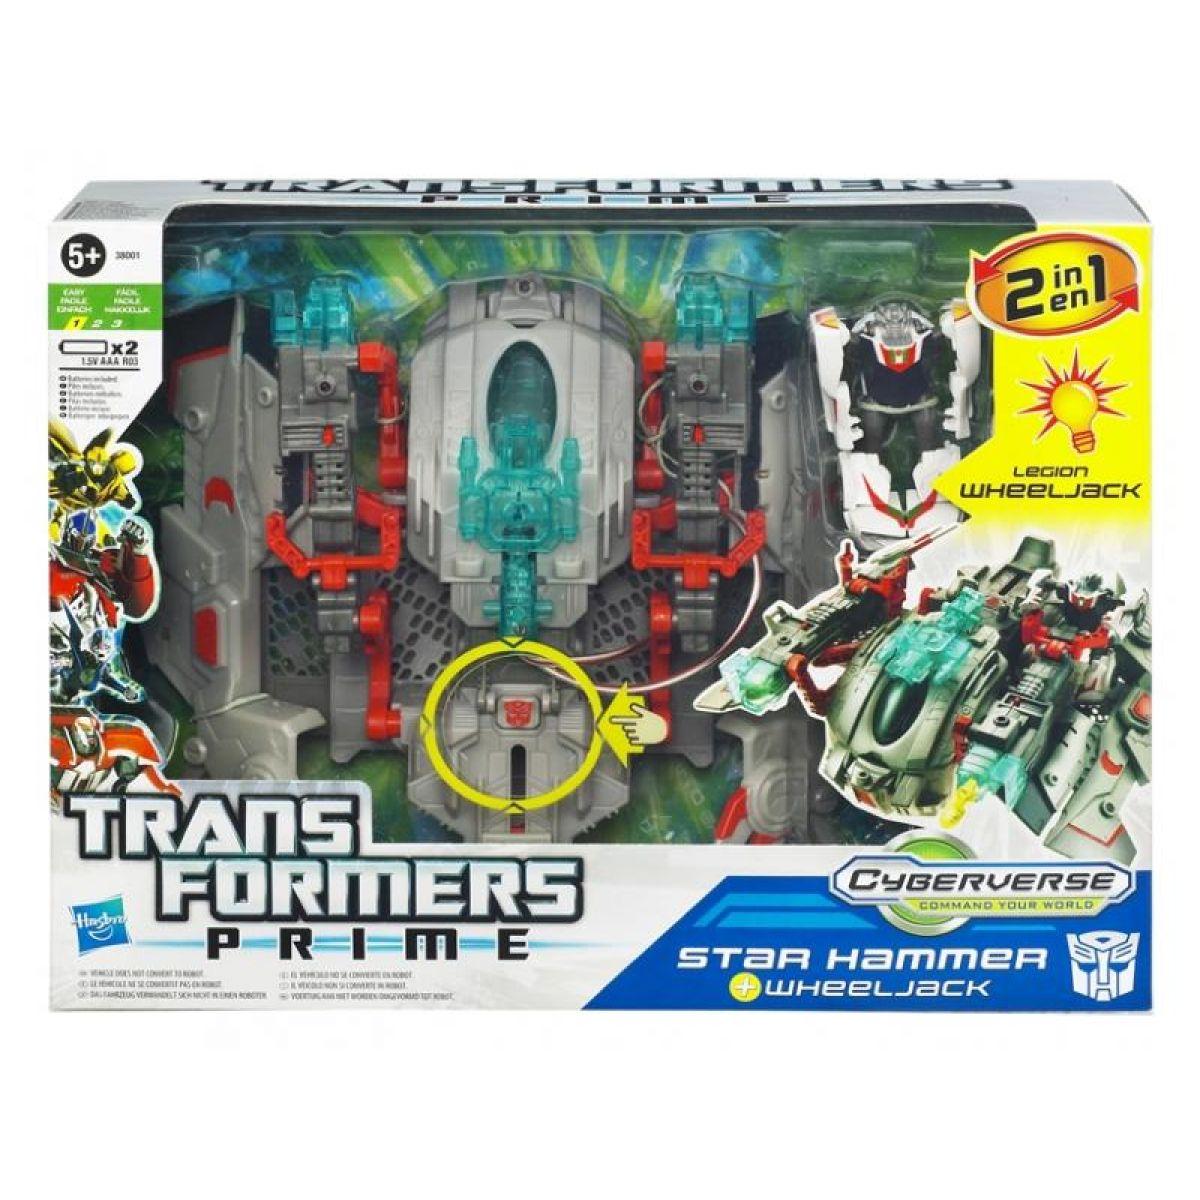 Transformers Prime Cyberverse Hasbro 38003 - Star Hammer